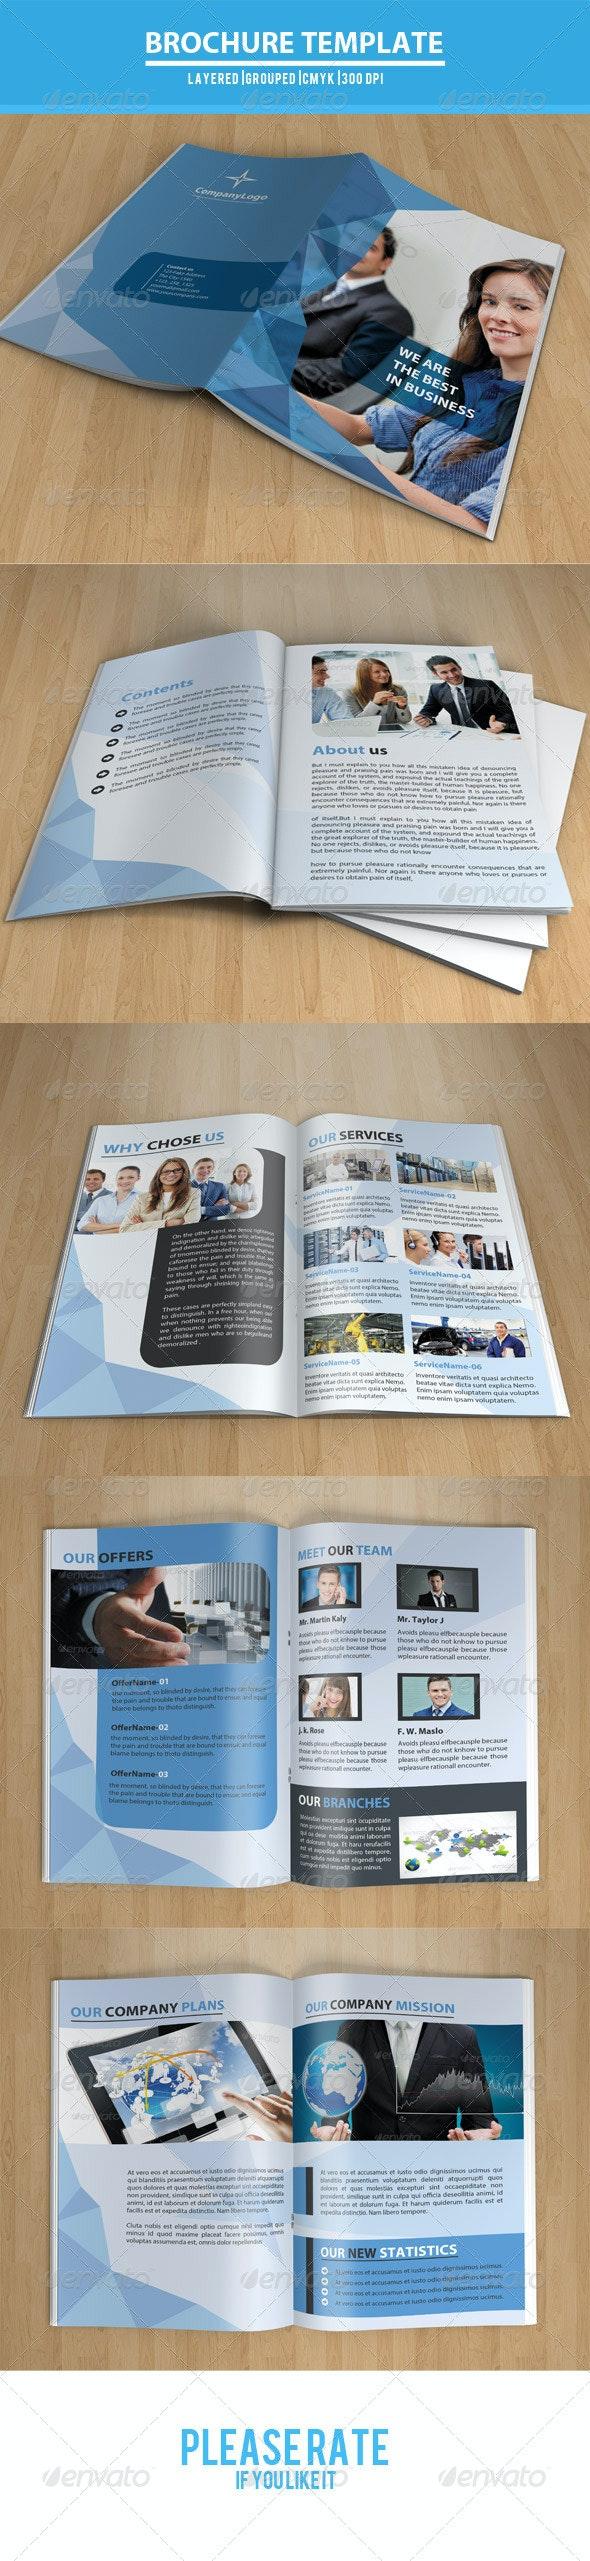 Bifold Business Brochure-V30 - Corporate Brochures